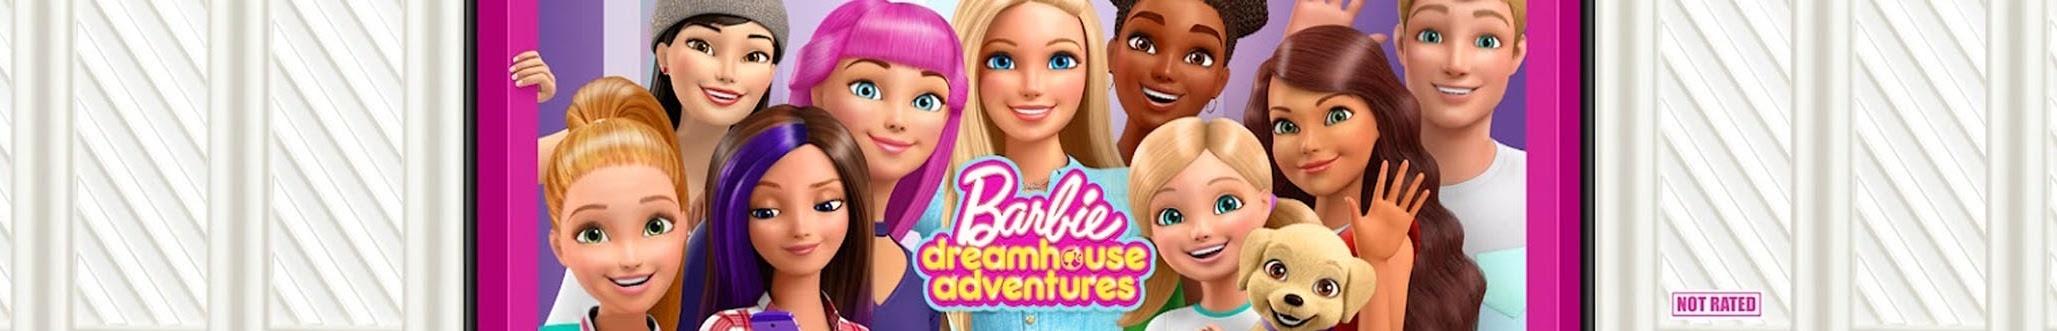 BarbieVideos banner